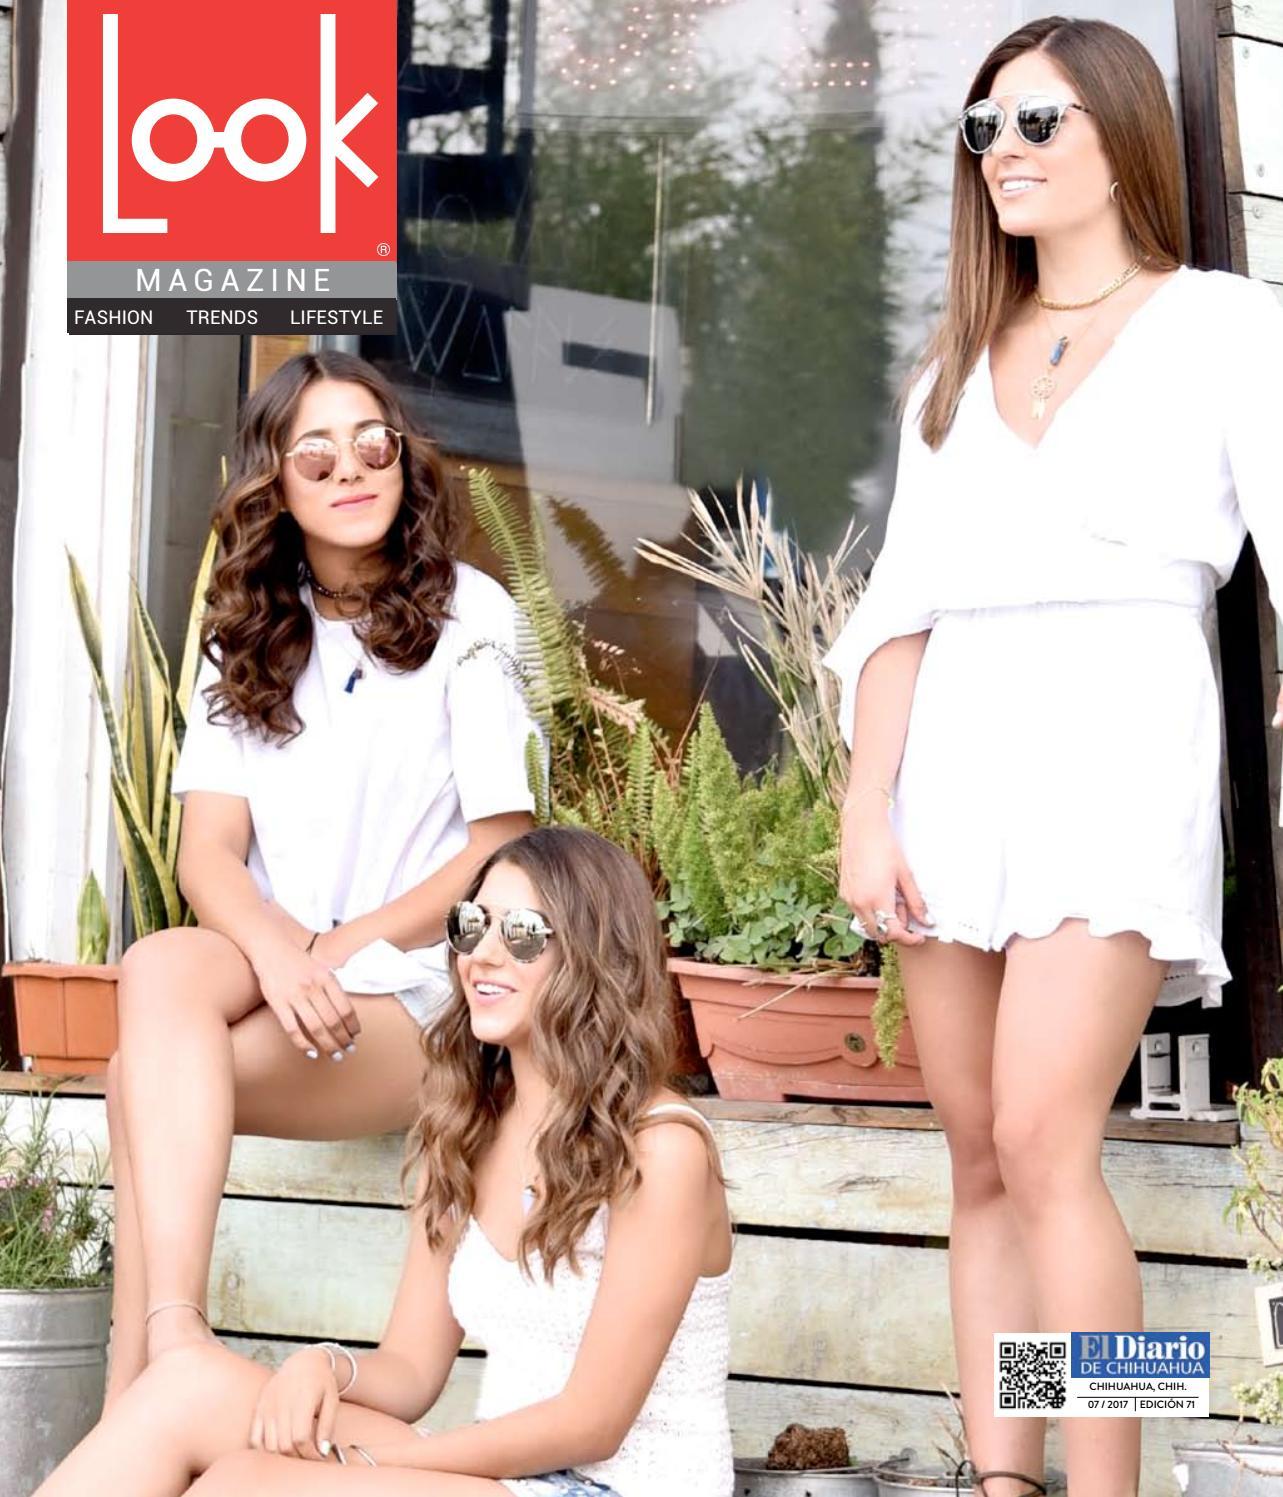 Febrero 2017 By Look Magazine Issuu # Muebles Batista Chihuahua